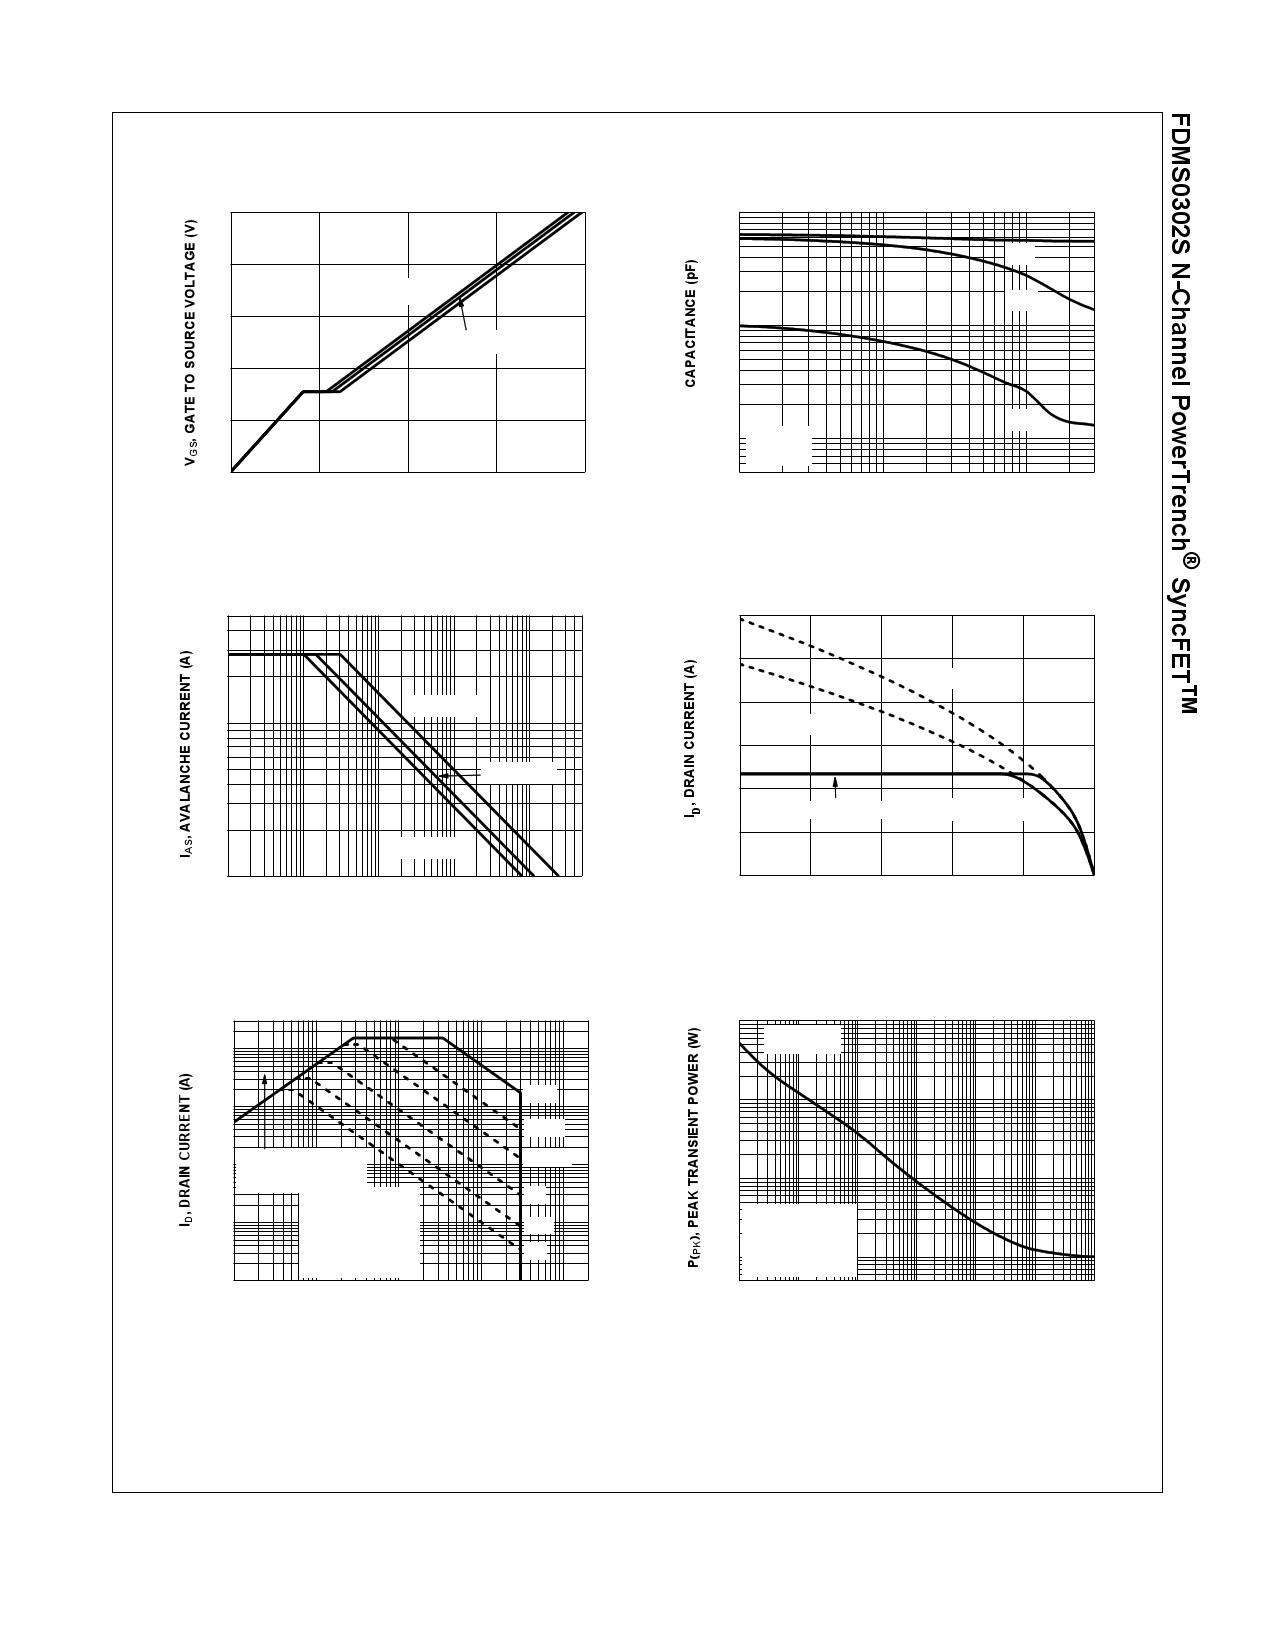 FDMS0302S pdf, 반도체, 판매, 대치품